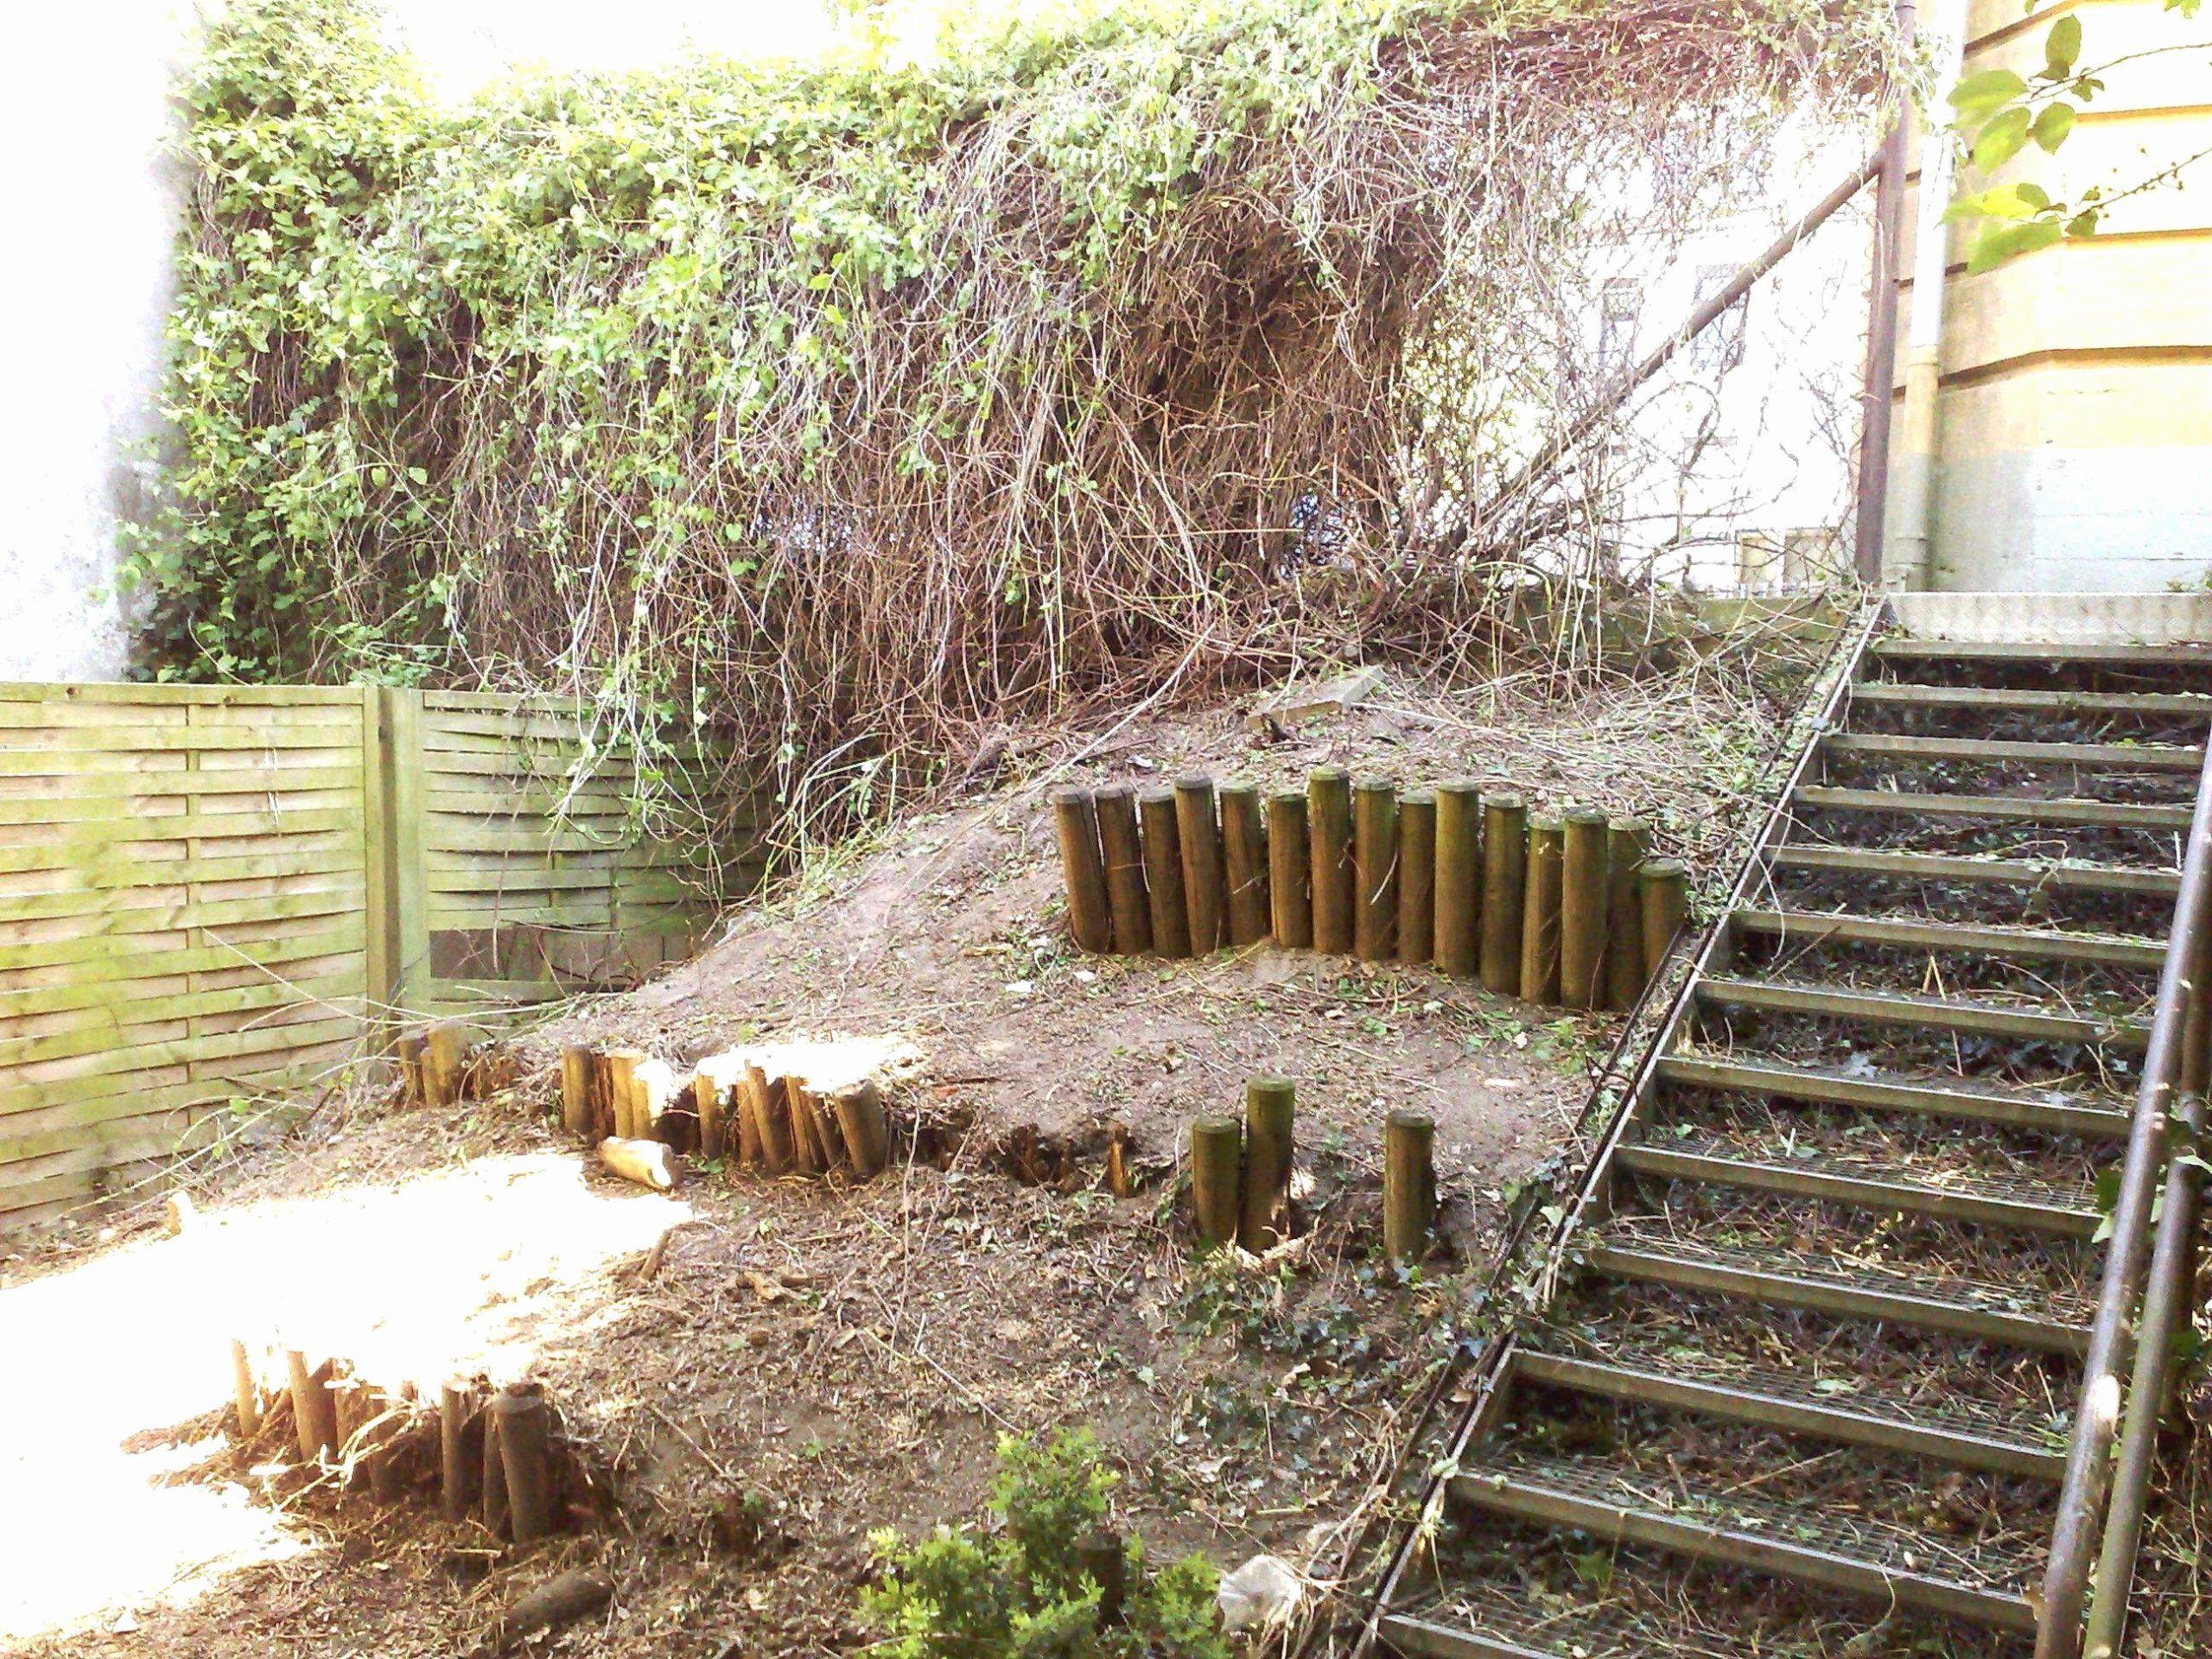 Terrassengestaltung Mit Pflanzen Best Of Outdoor Zen Garden Inspirational Outdoor Zen Garden Lit at